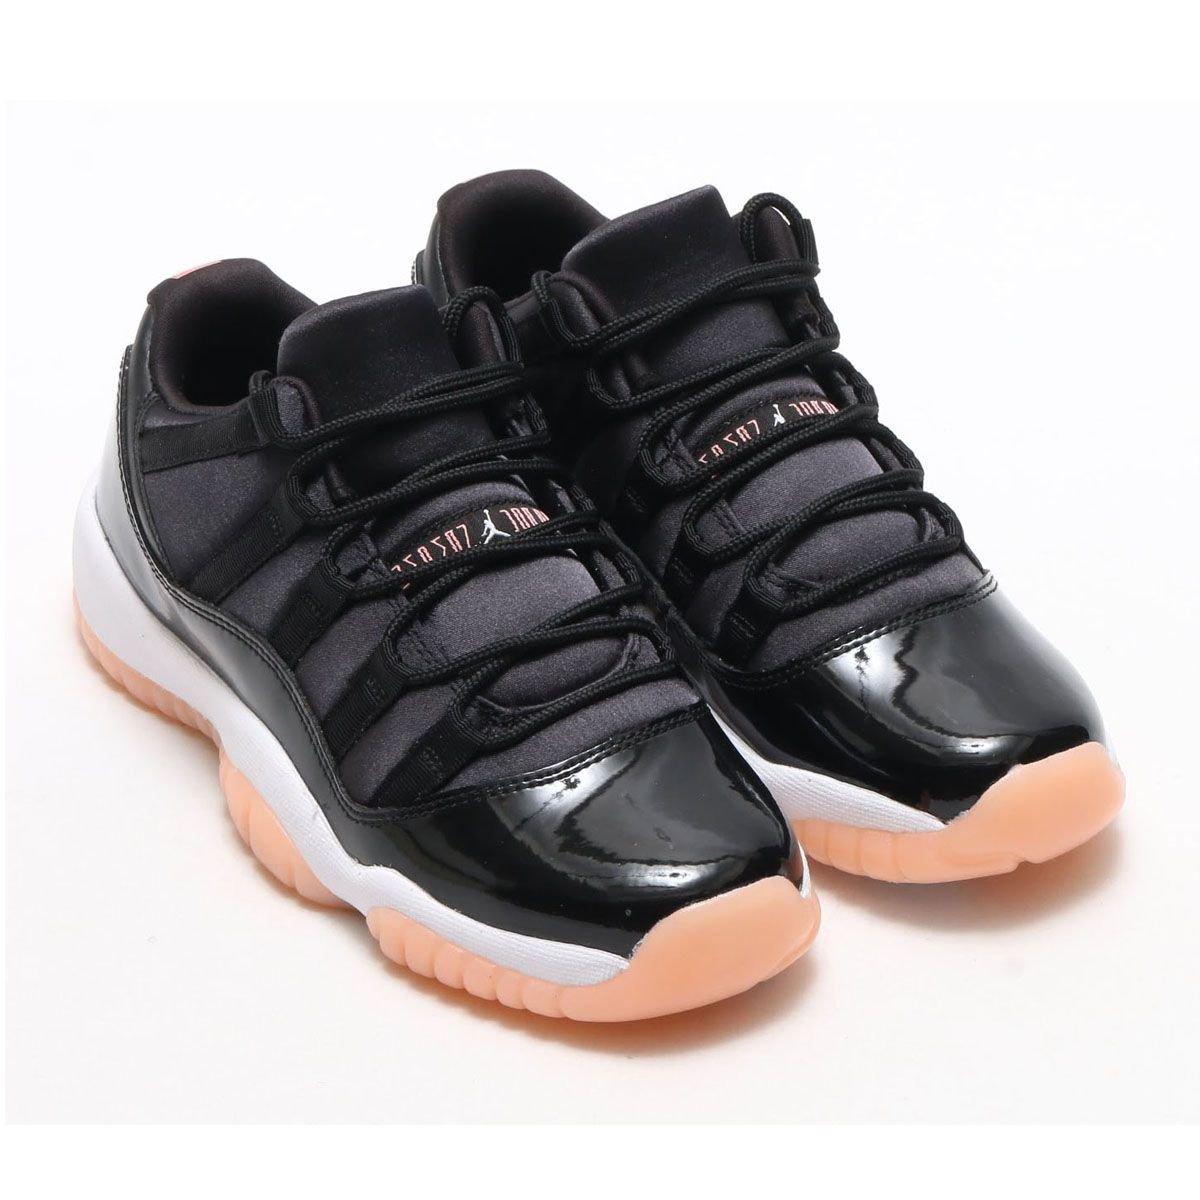 buy online ac2ea 04332 NIKE AIR JORDAN 11 RETRO LOW GG BLACK BLEACHED CORAL-WHITE 2018.4.7 9 00  RELEASE https   buff.ly 2qczhDB pic.twitter.com pcoM6QAcV8